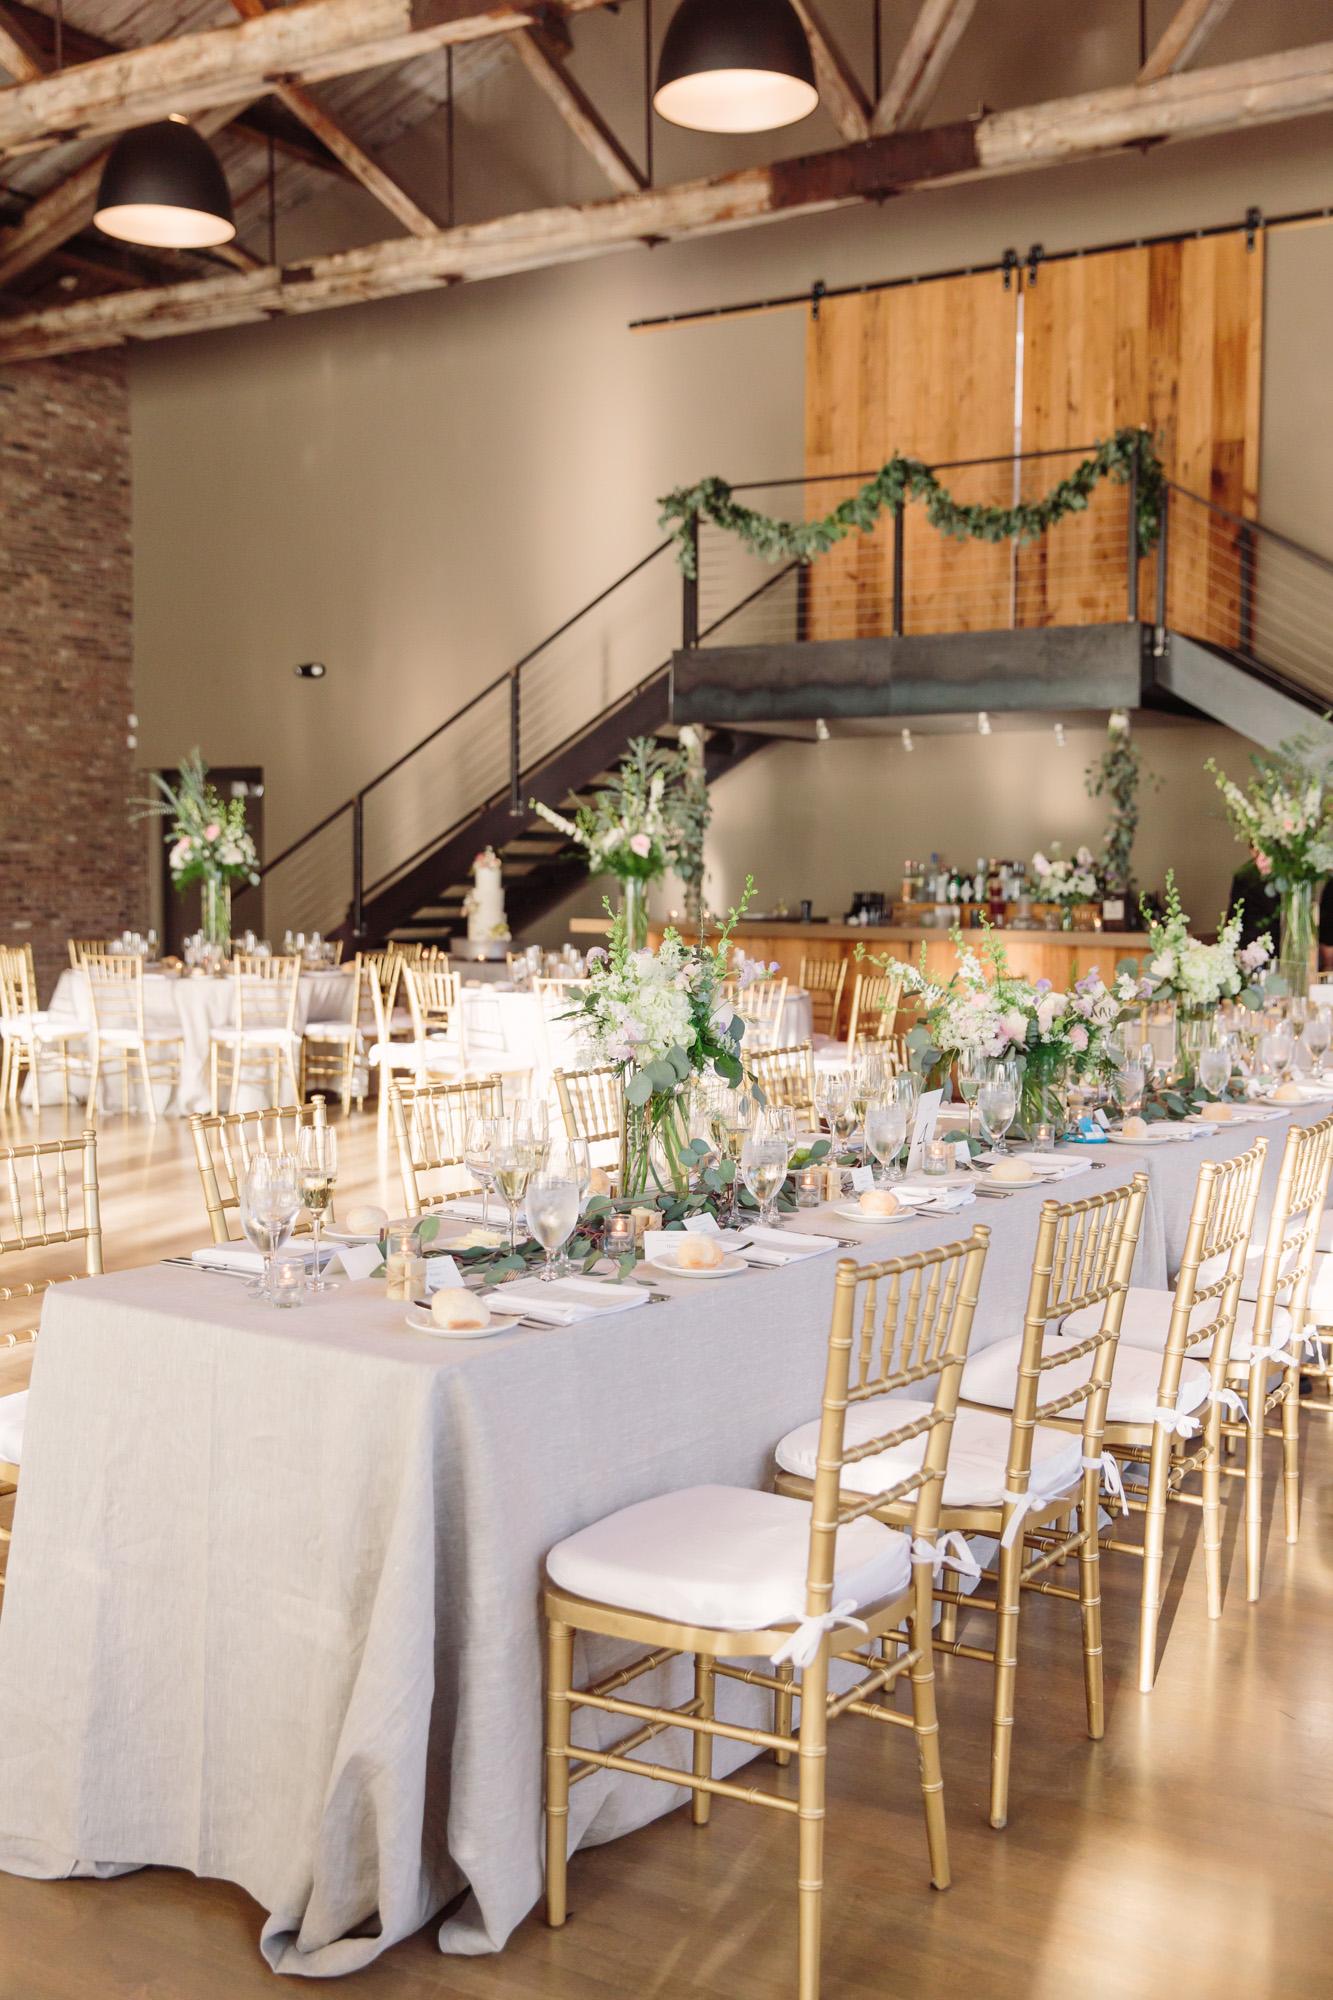 60_Rowan_Brian_The_Roundhouse_Wedding_Beacon_NY_Tanya_Salazar_Photography_1212.jpg